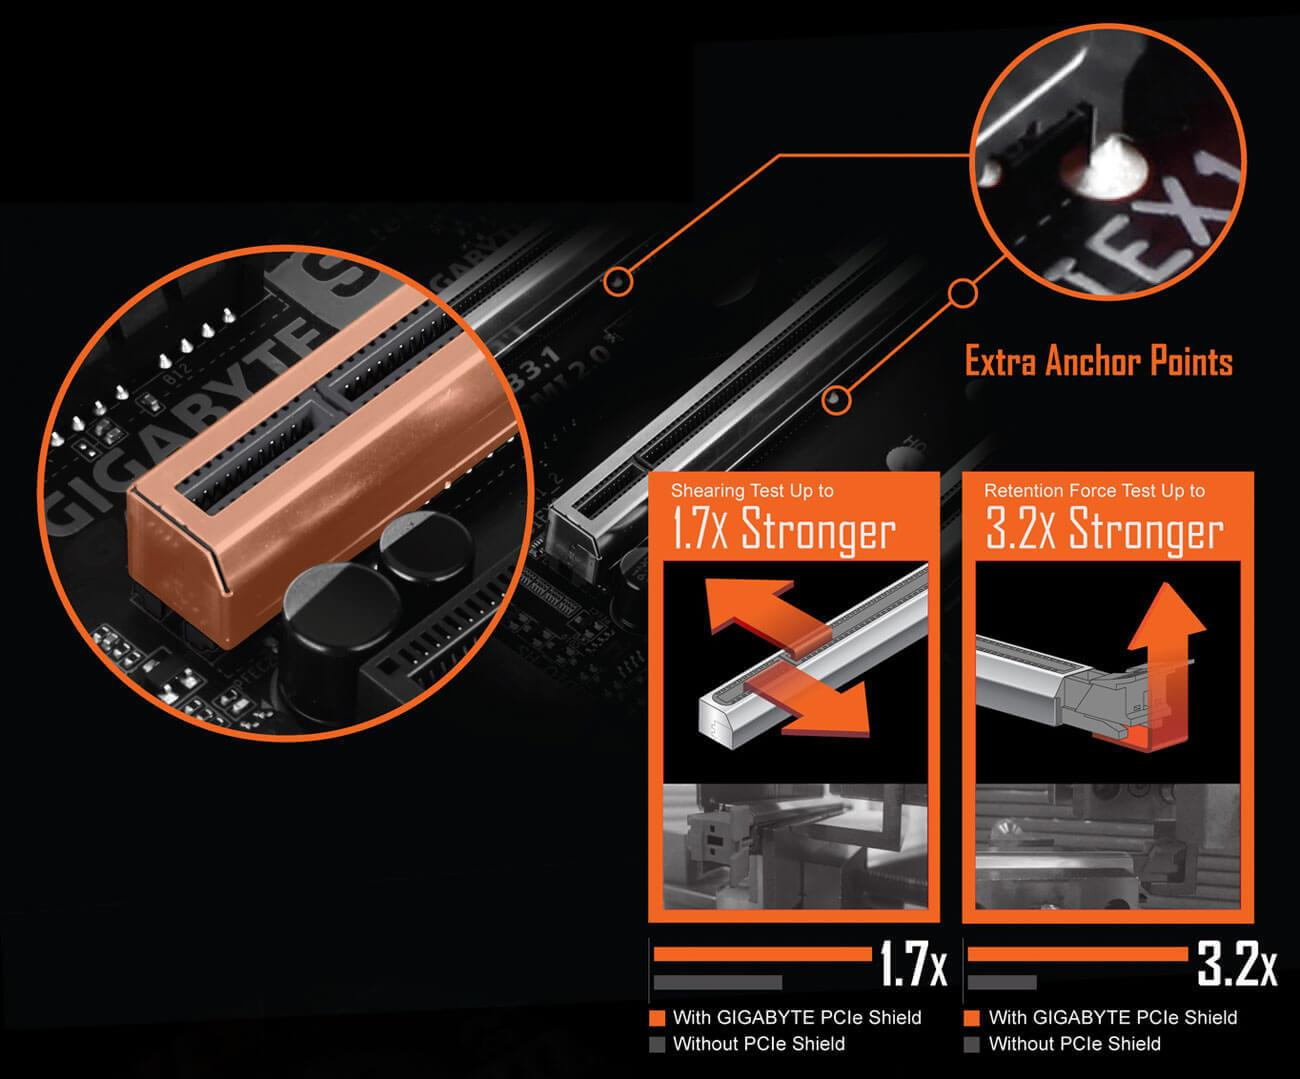 Buy the Gigabyte Z390 AORUS PRO WIFI ATX Form Factor, For